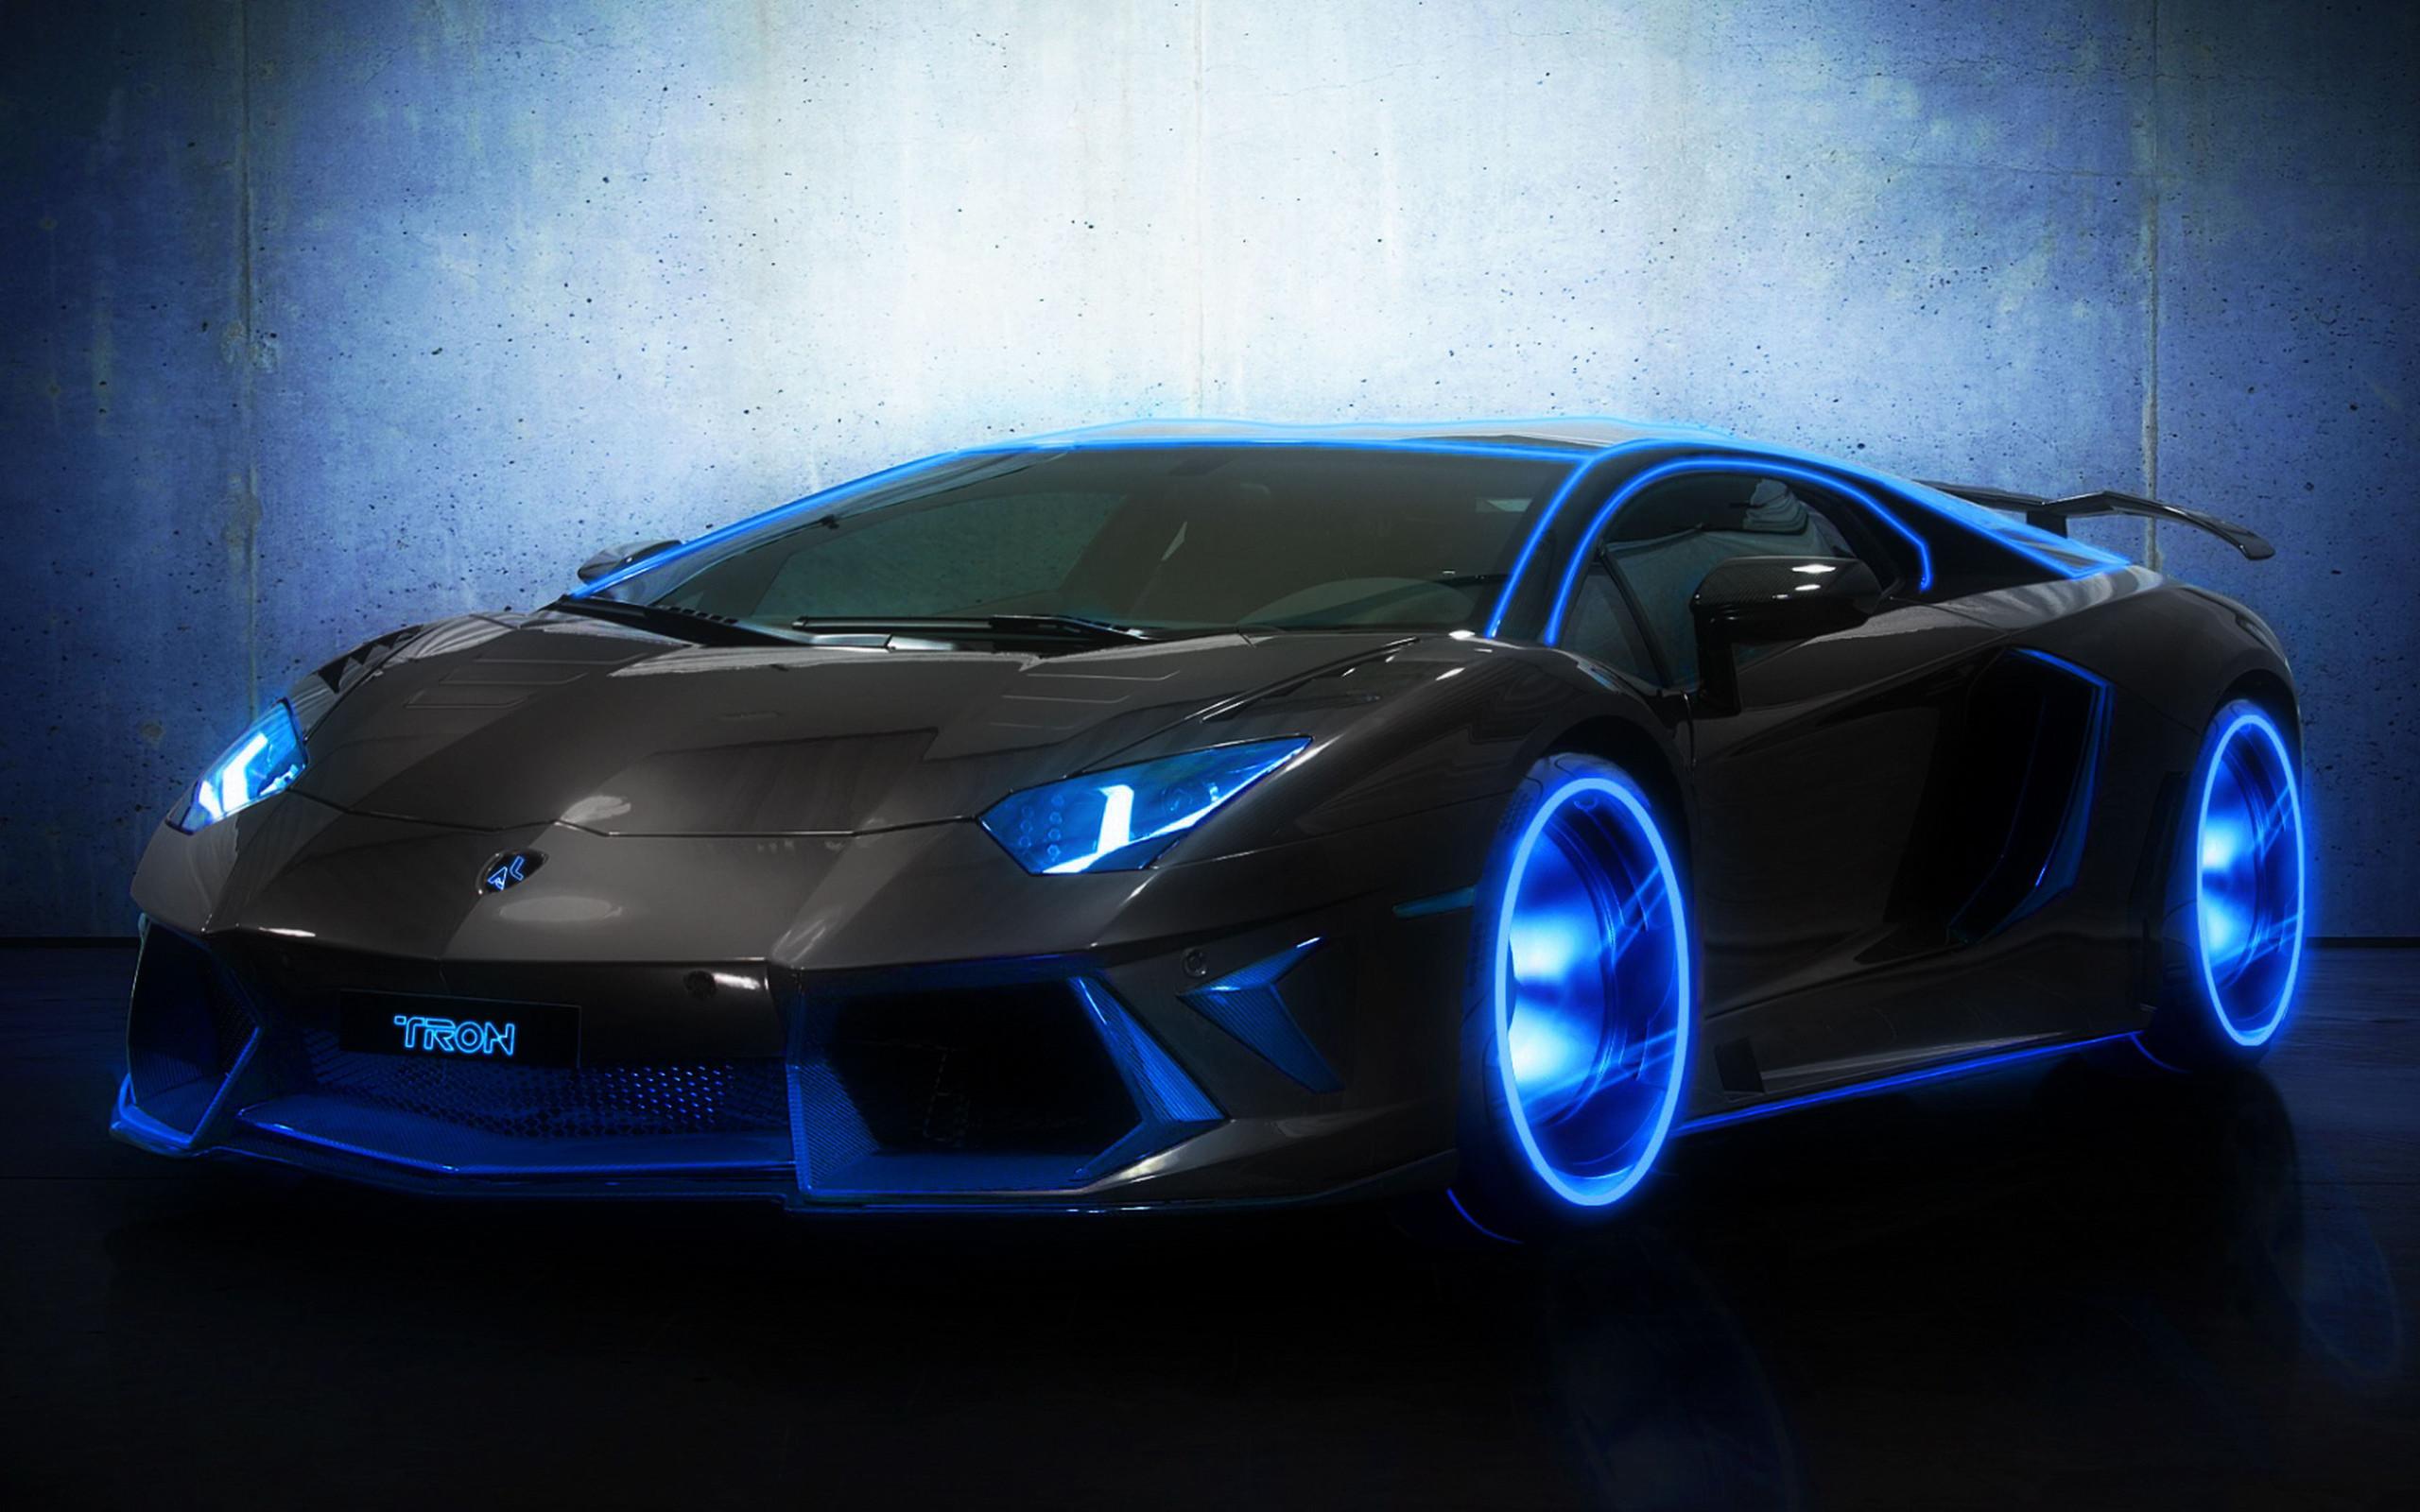 2560x1600 HD Wallpaper | Background ID:375840. 2560x1600 Vehicles Lamborghini  Aventador